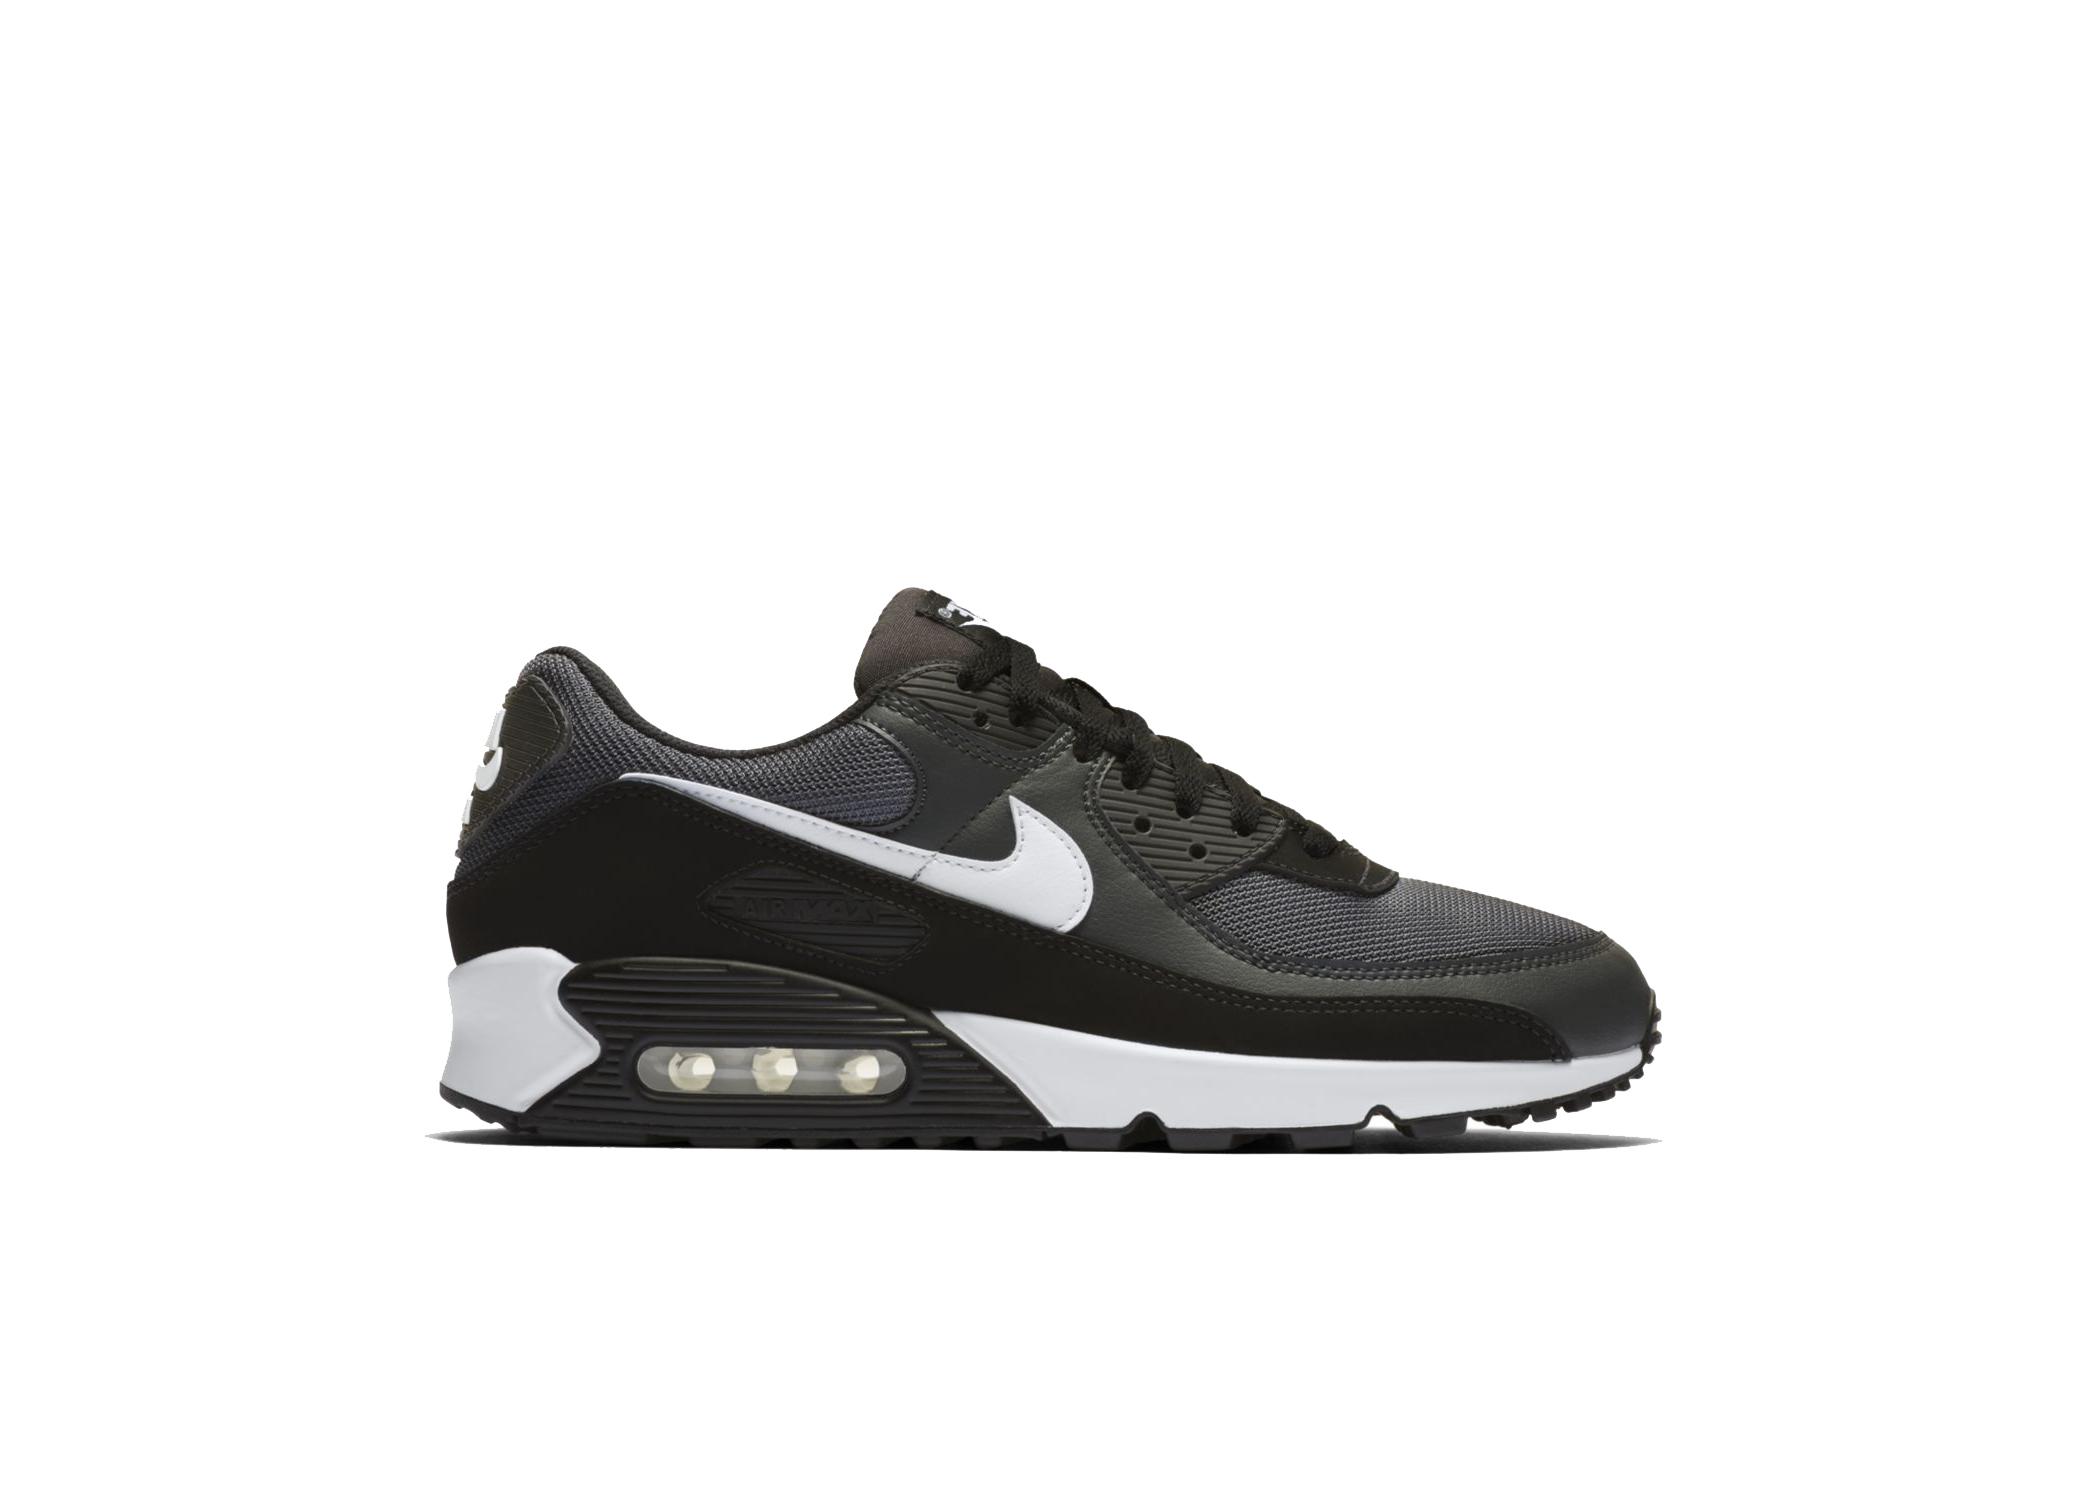 Nike Air Max 90 Iron Grey